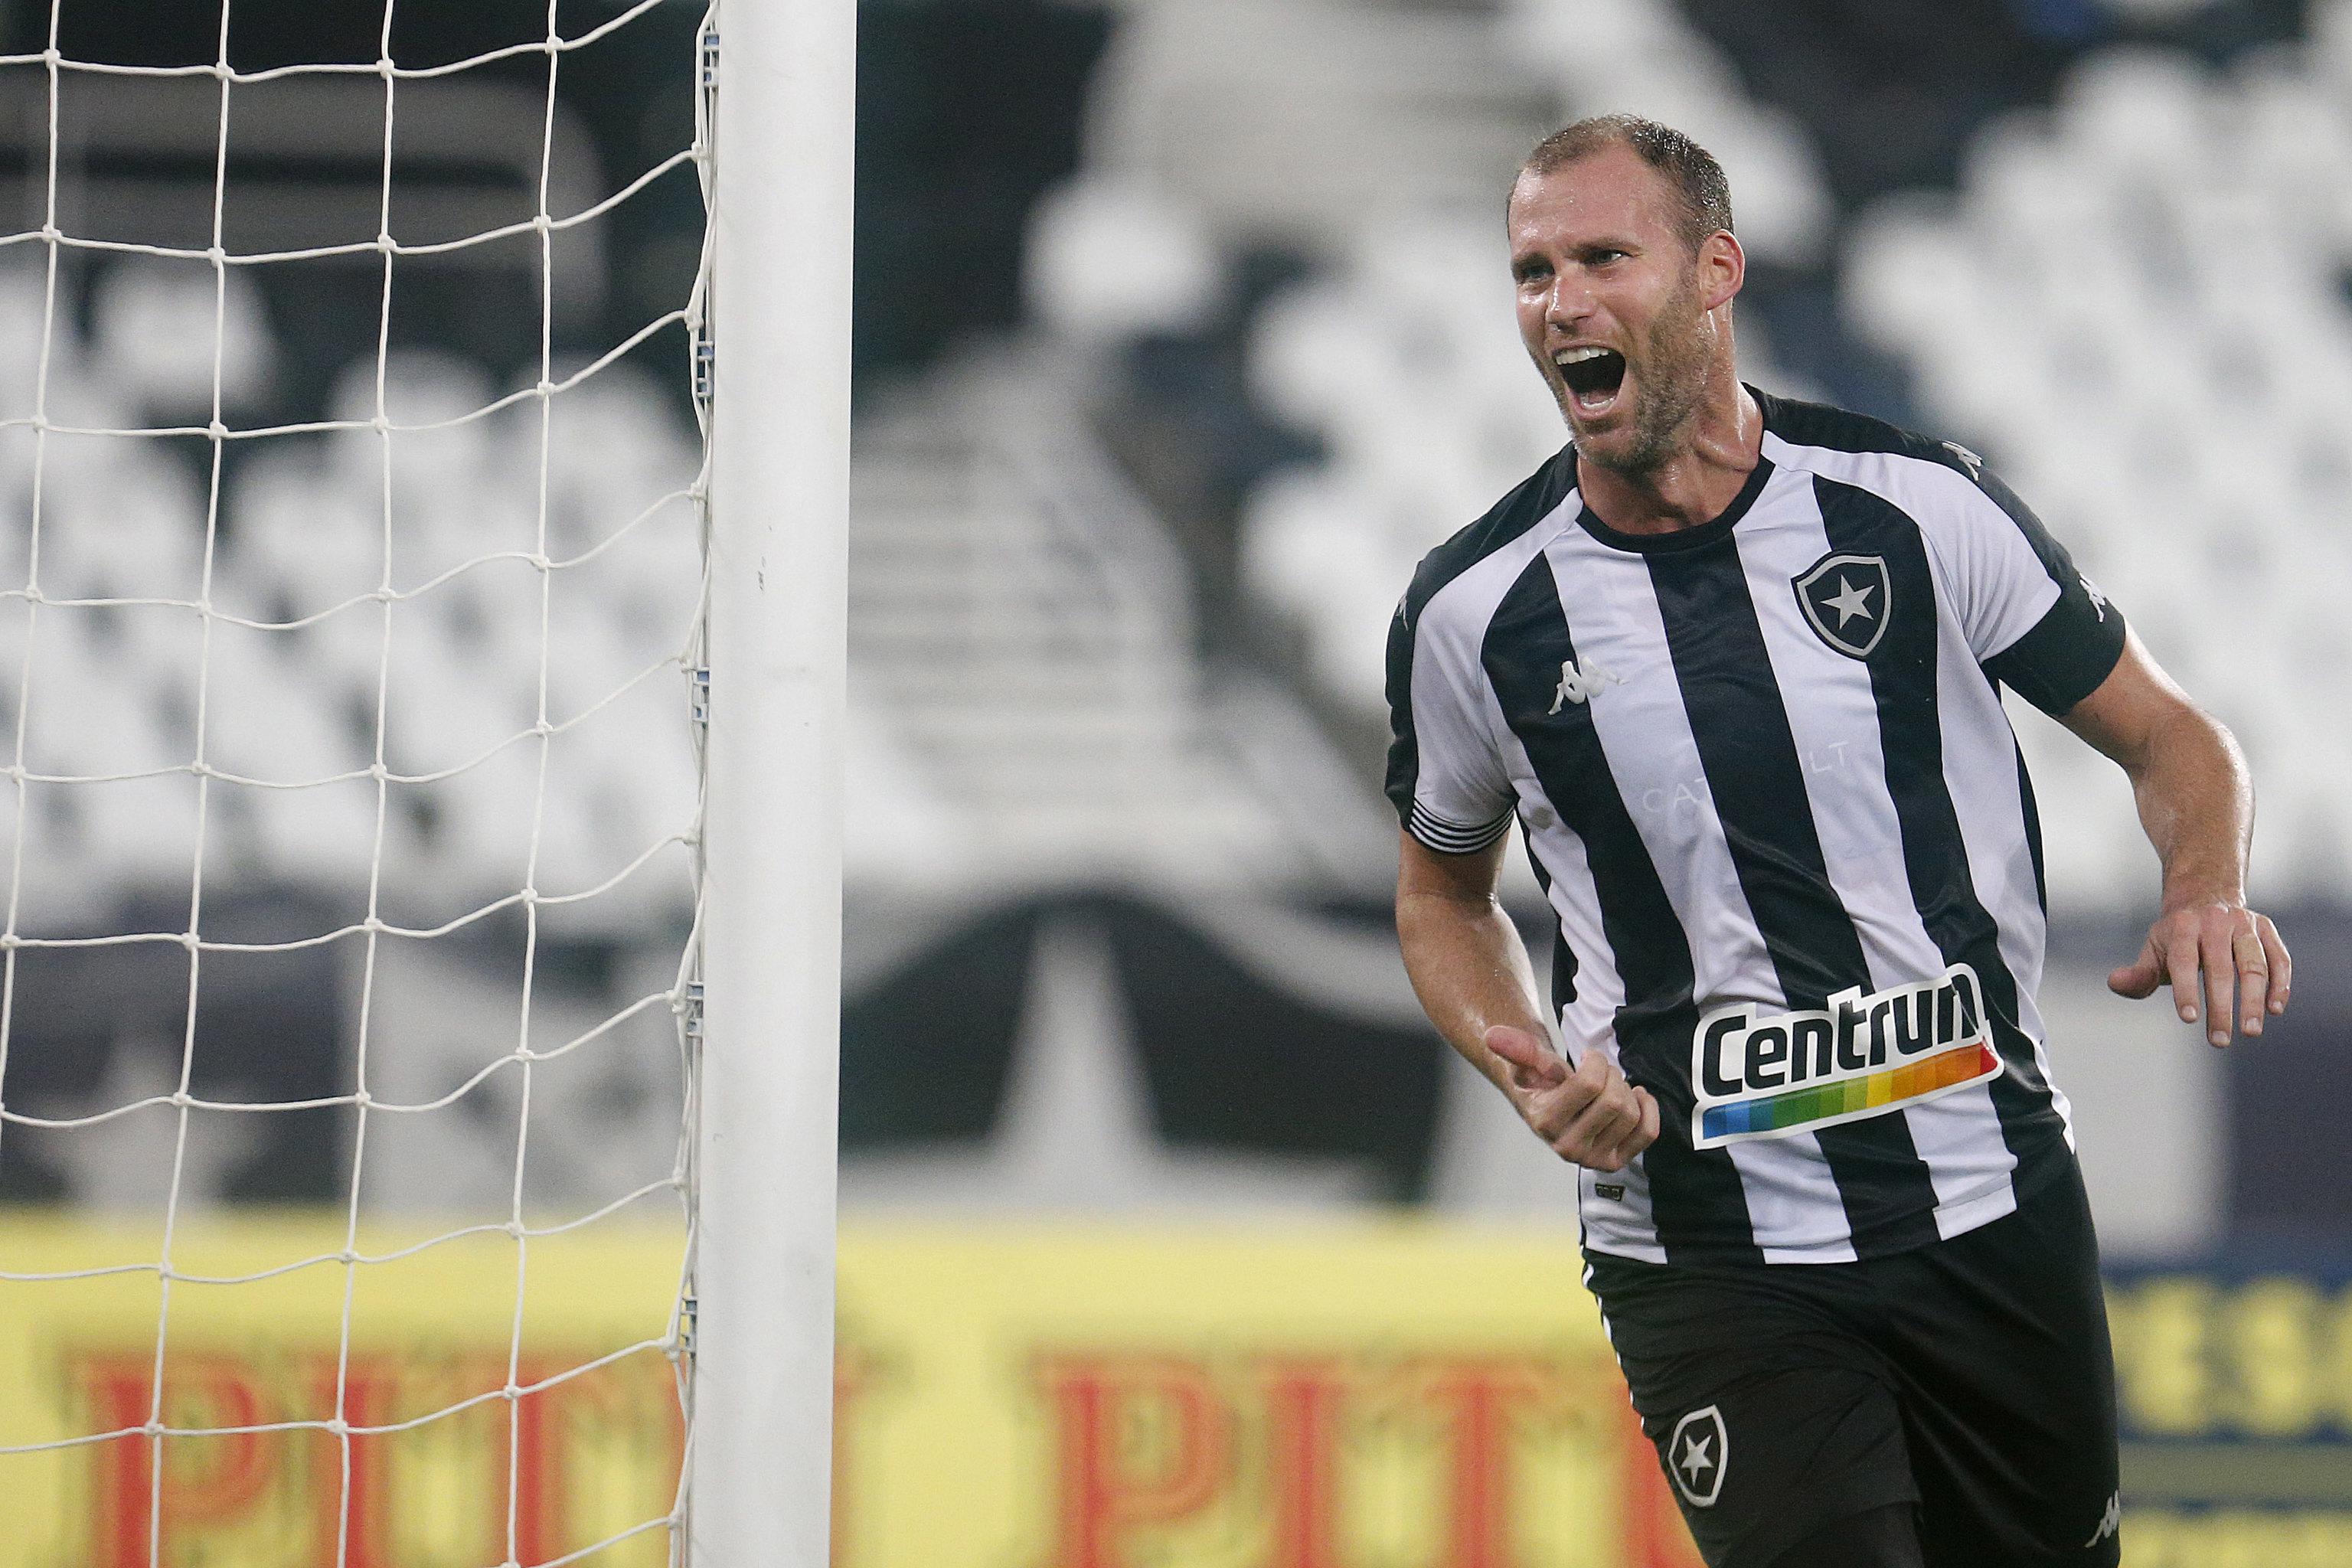 Joel Carli marca o gol da vitória Alvinegra. (Foto: Vitor silva/Botafogo)